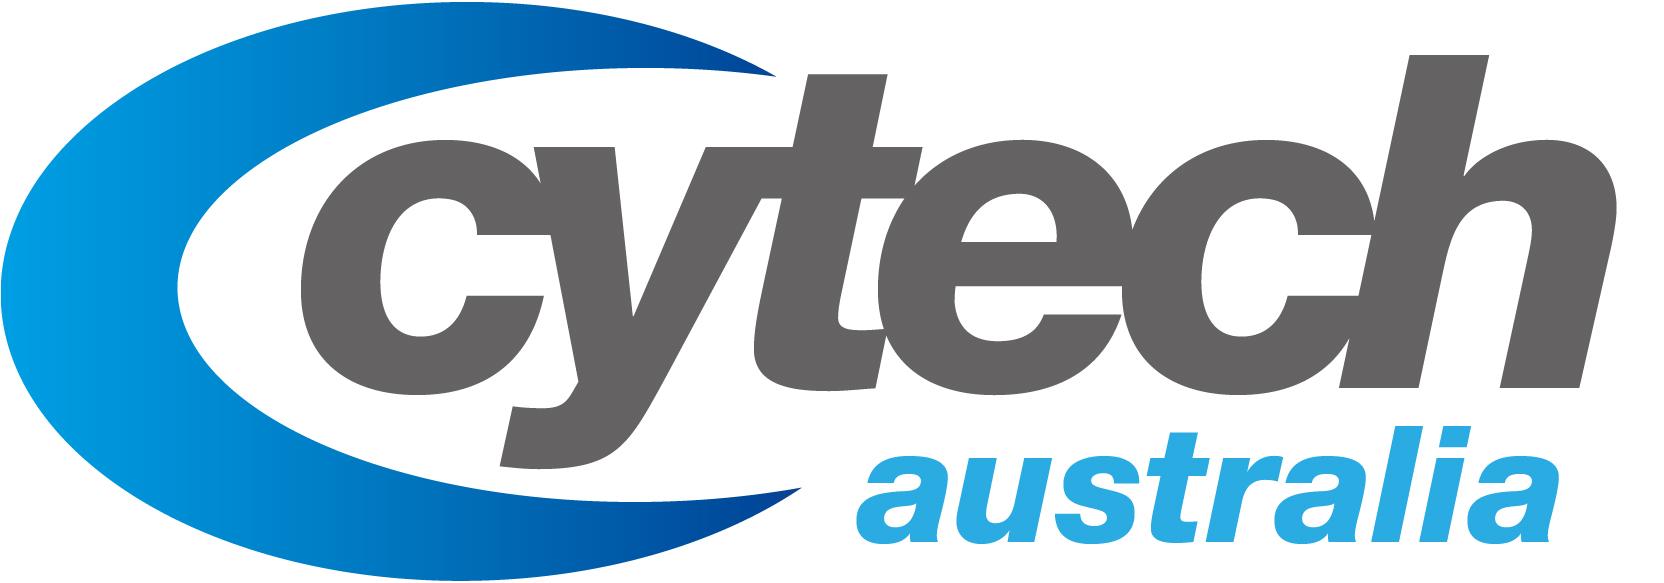 Cytech Australia Logo